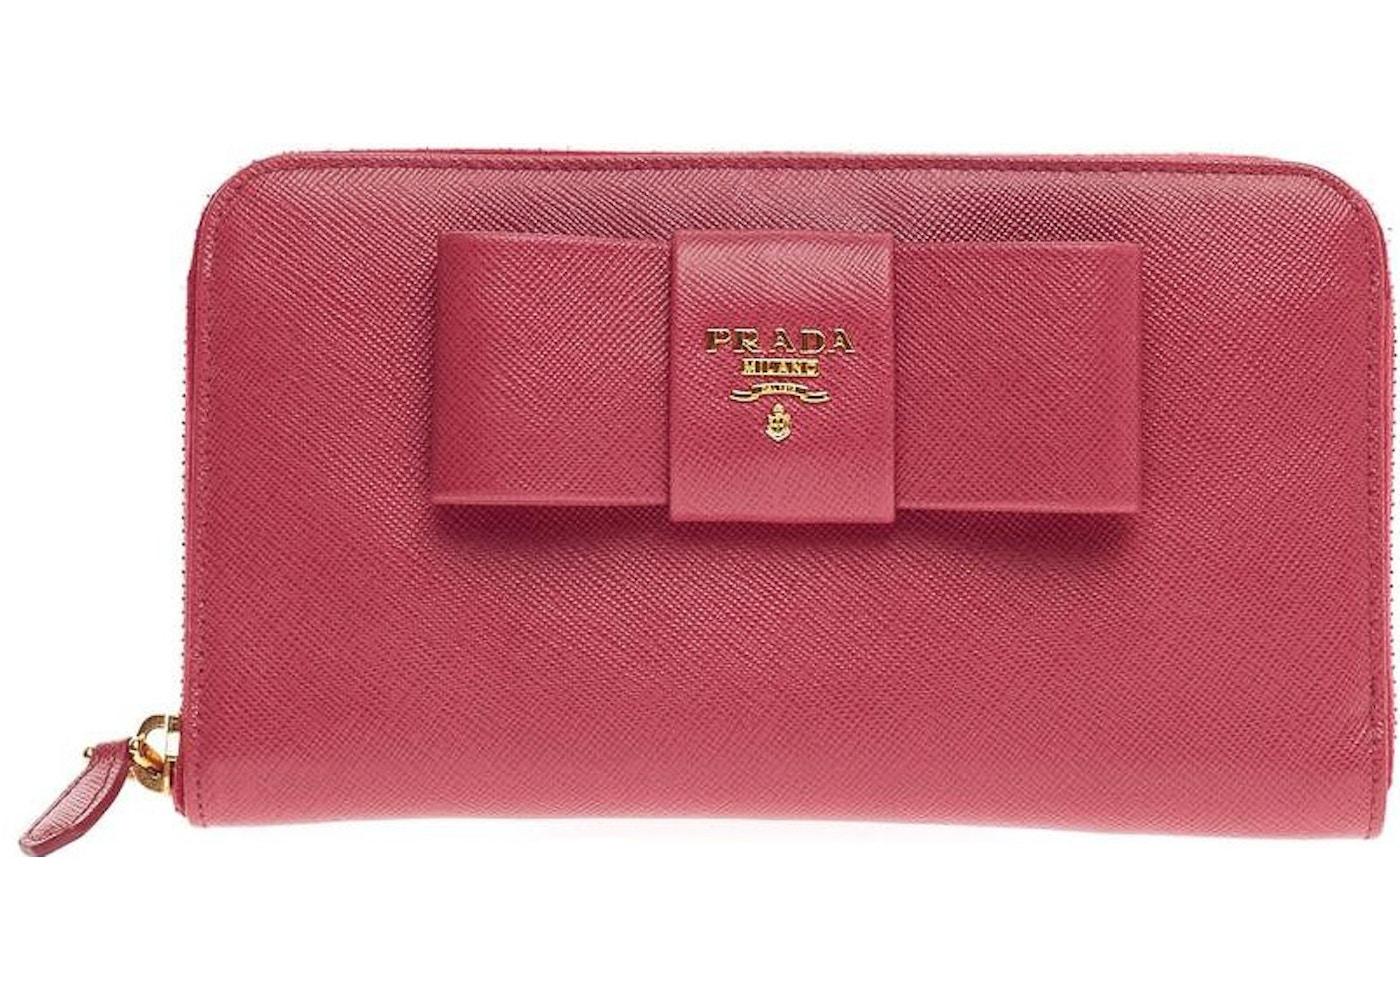 a92d84f45926f2 Prada Zip Around Bow Wallet Saffiano Pink. Saffiano Pink